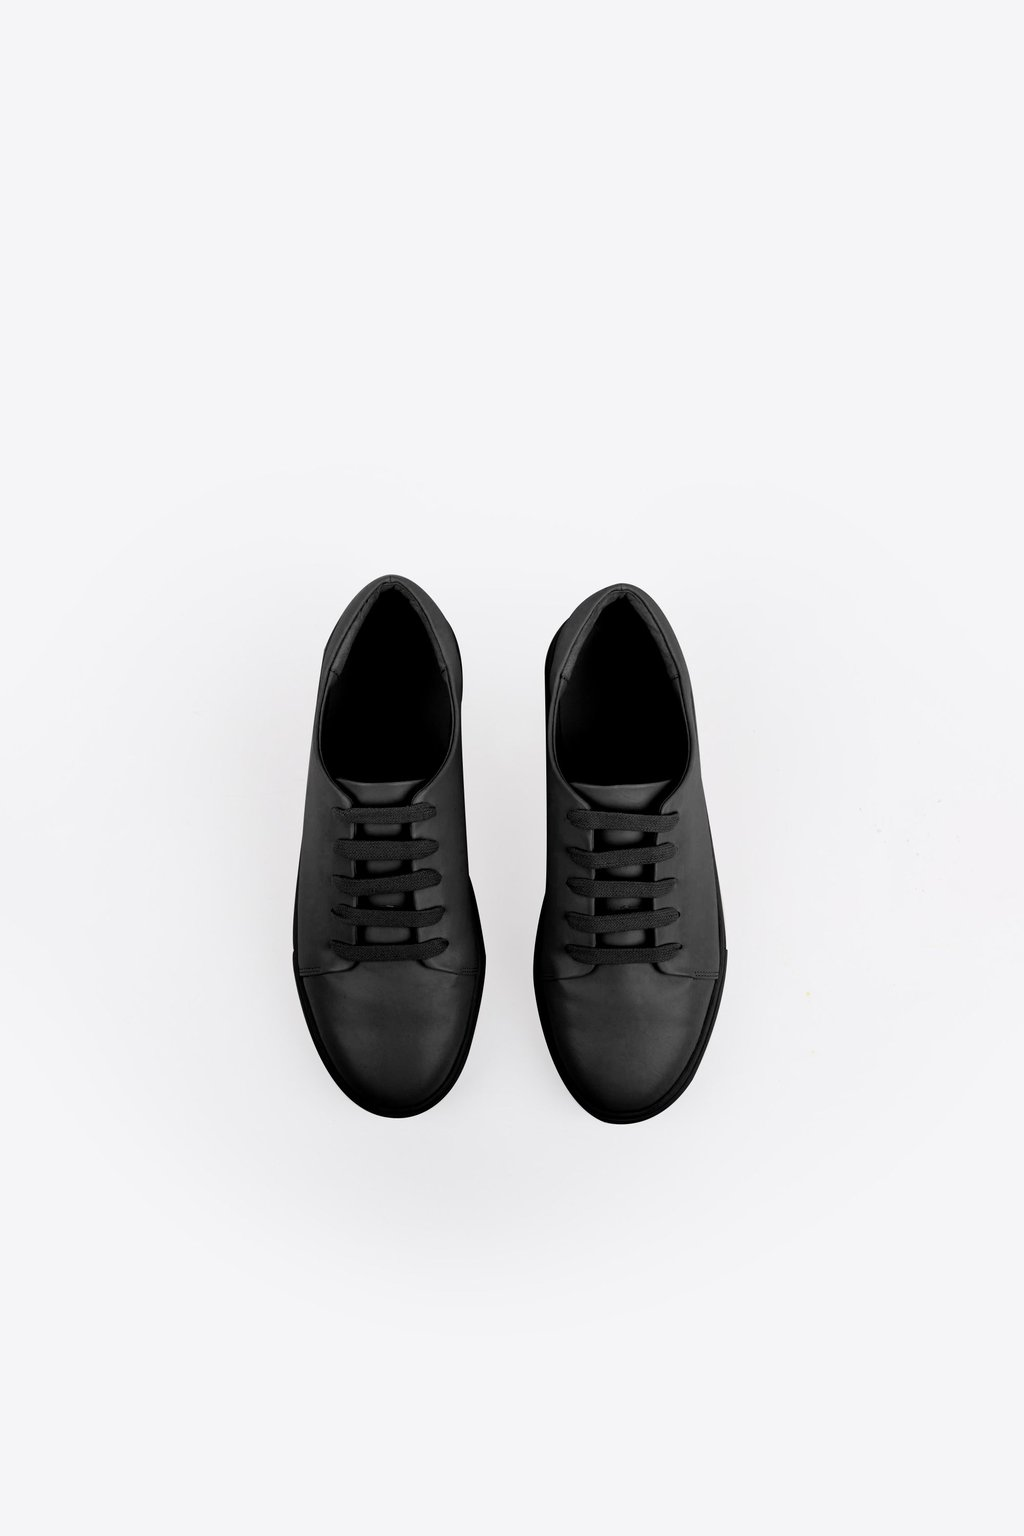 Sneaker 1339 Black 10